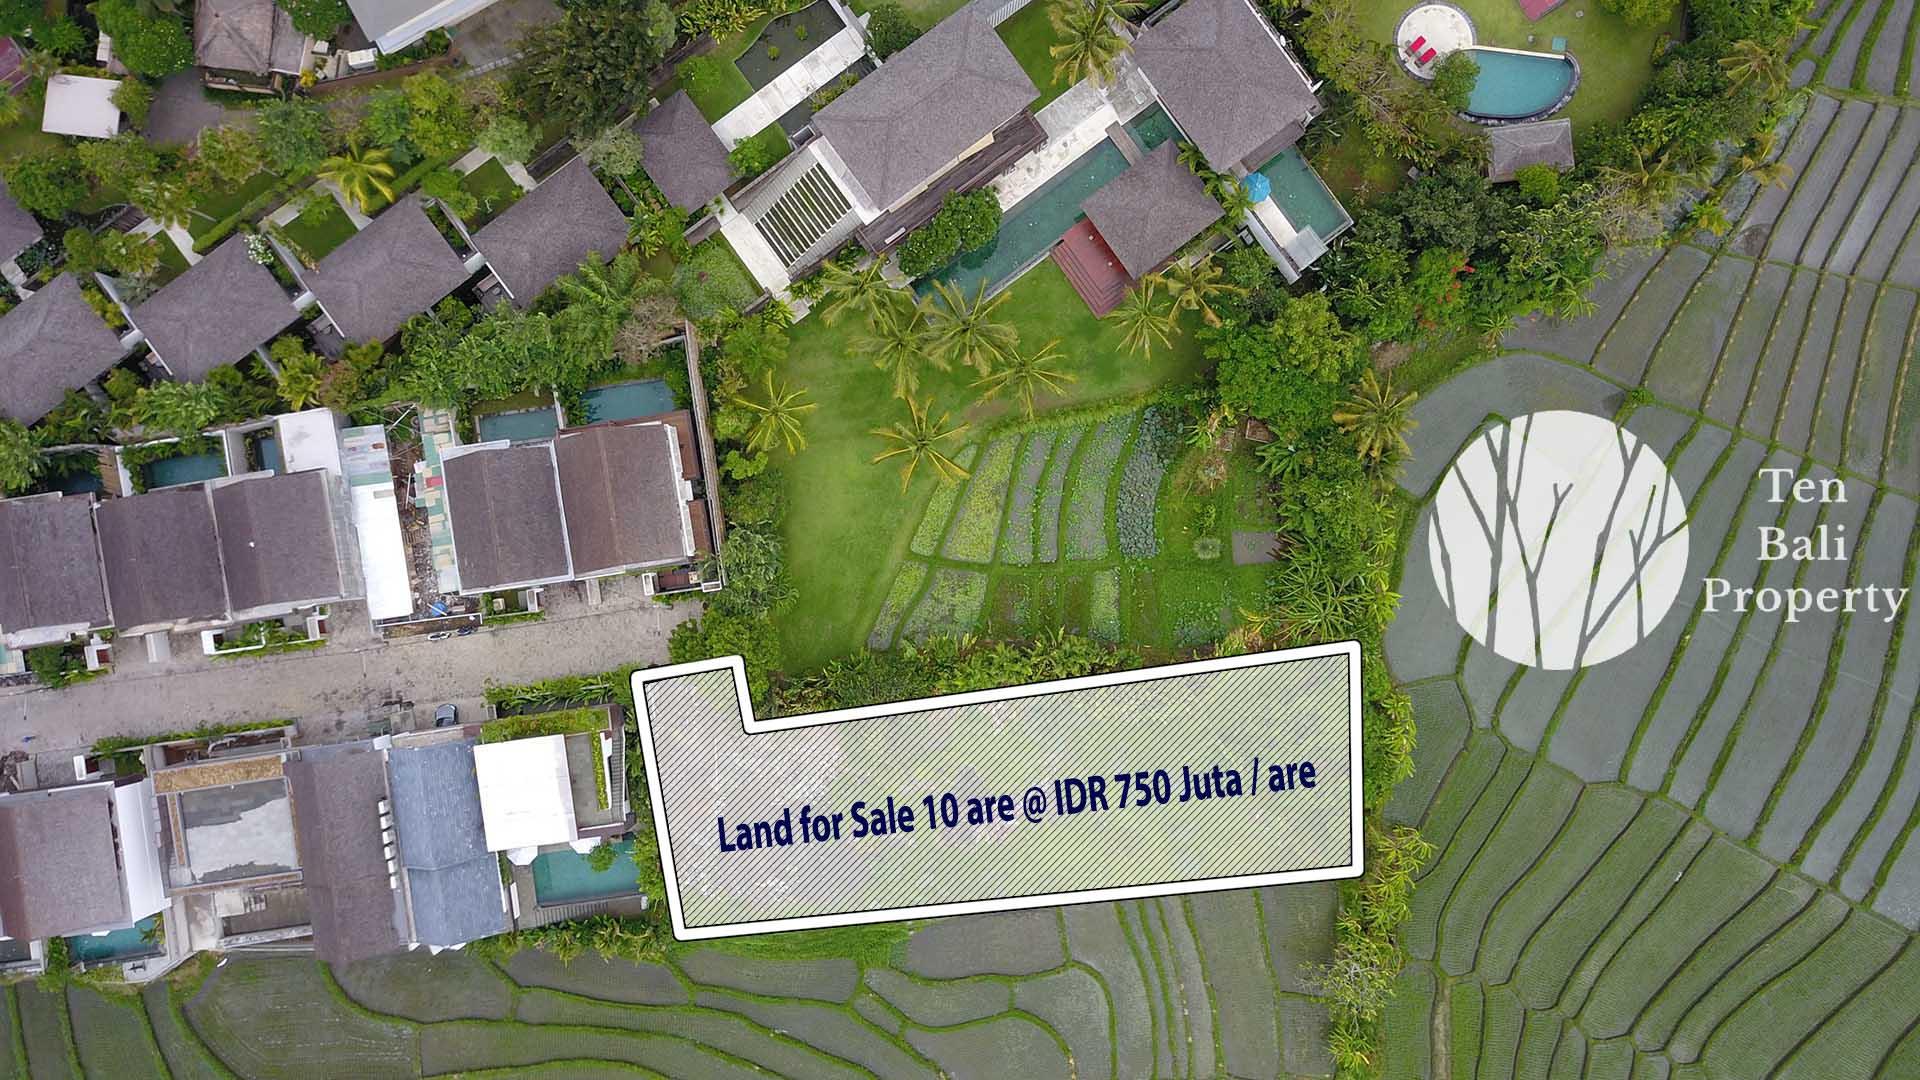 Bali Land for Sale Freehold Canggu